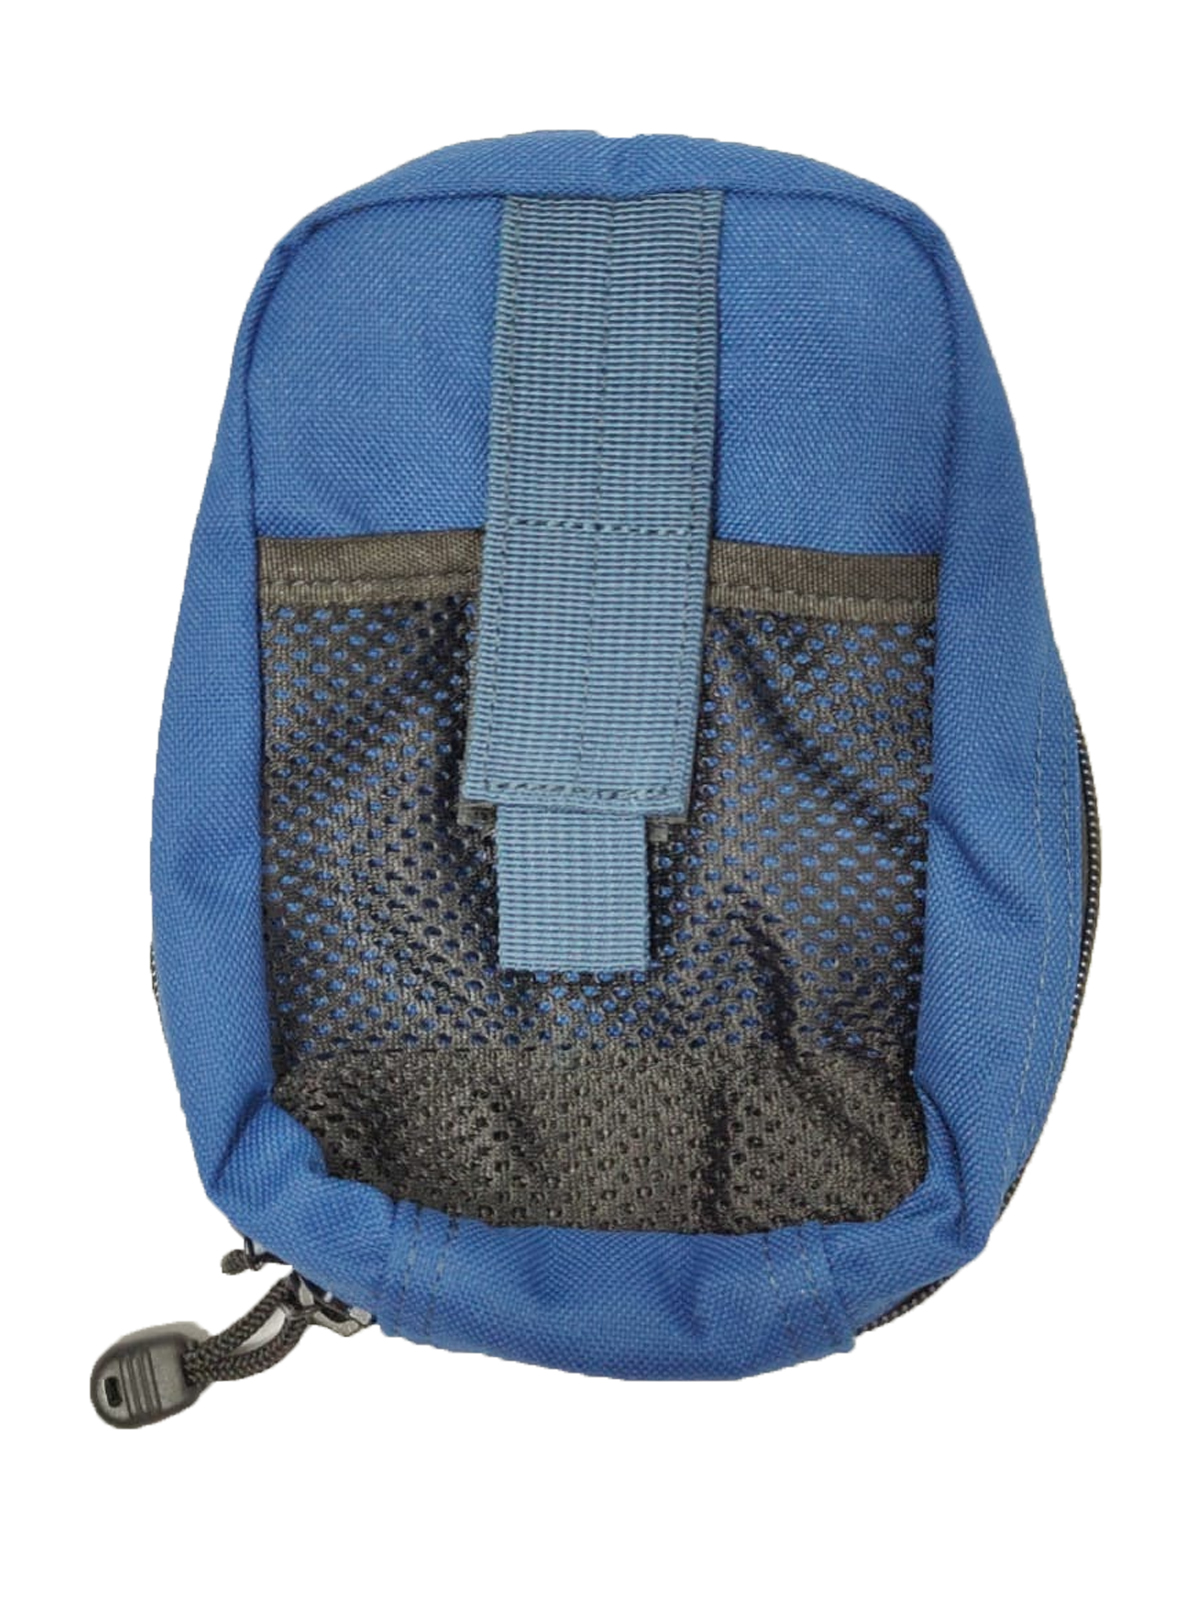 blue-pouch-2.jpg